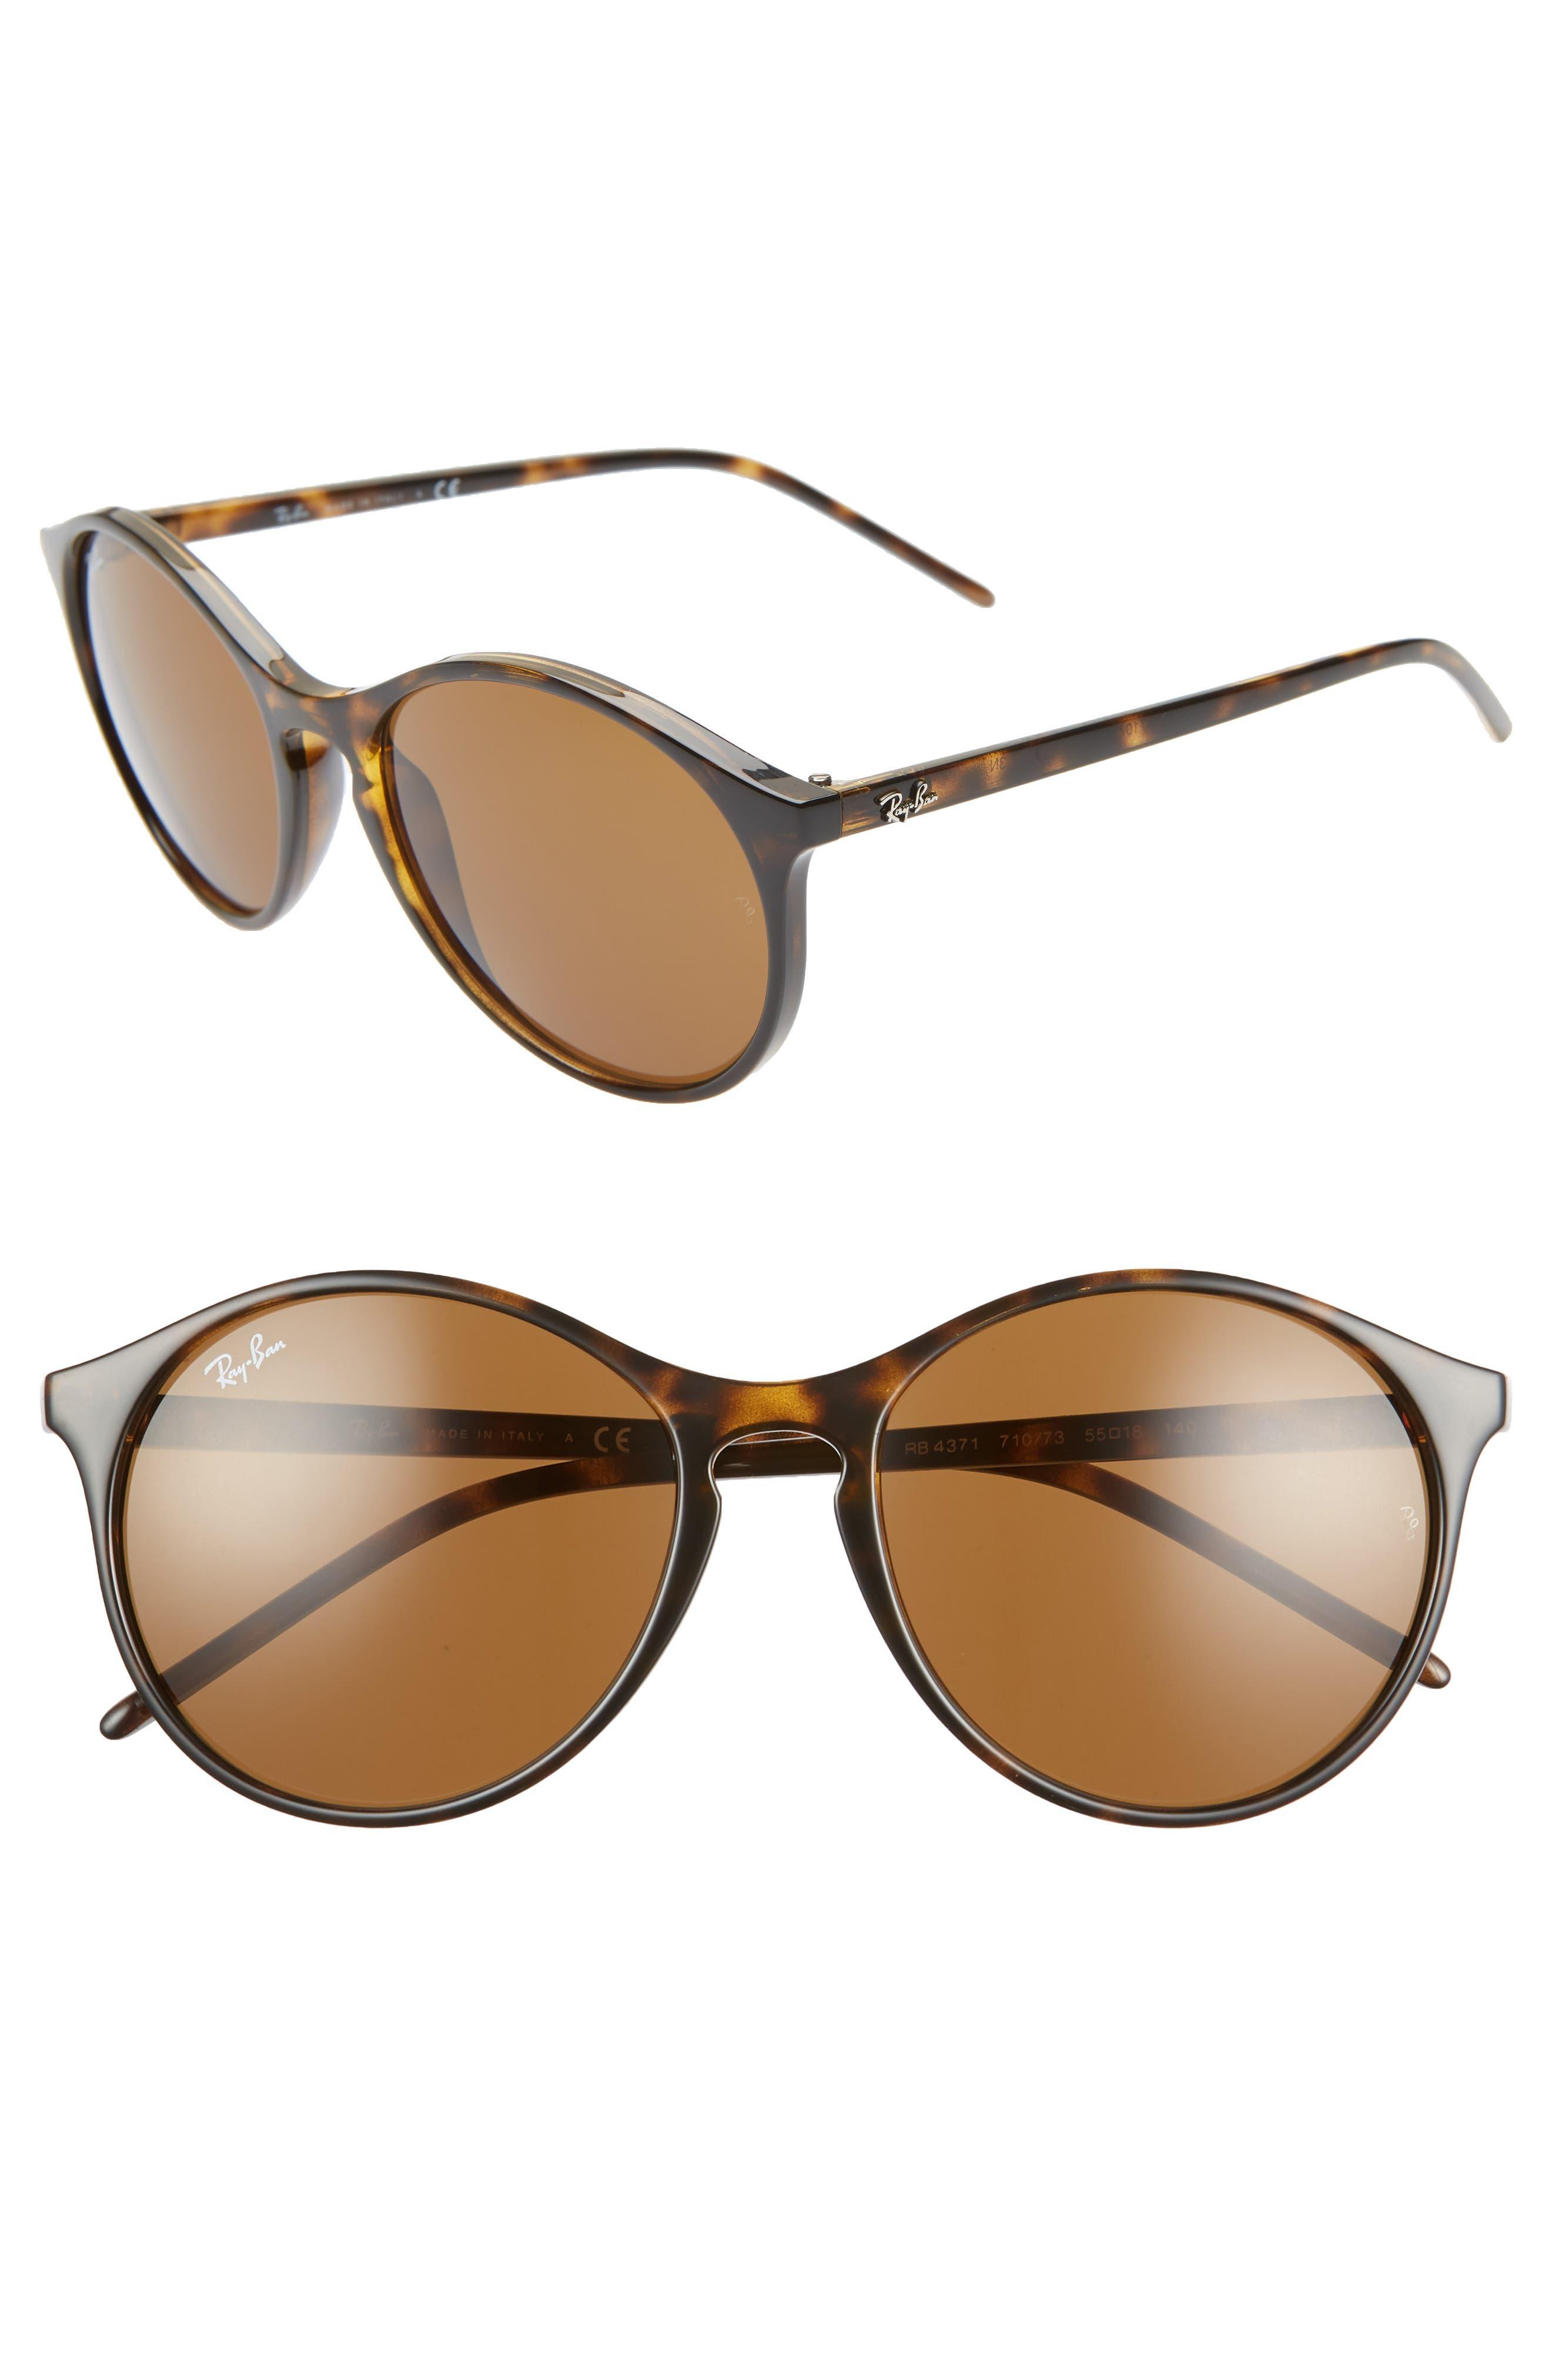 Ray-Ban Highstreet 55Mm Round Sunglasses - Havana/ Green Solid